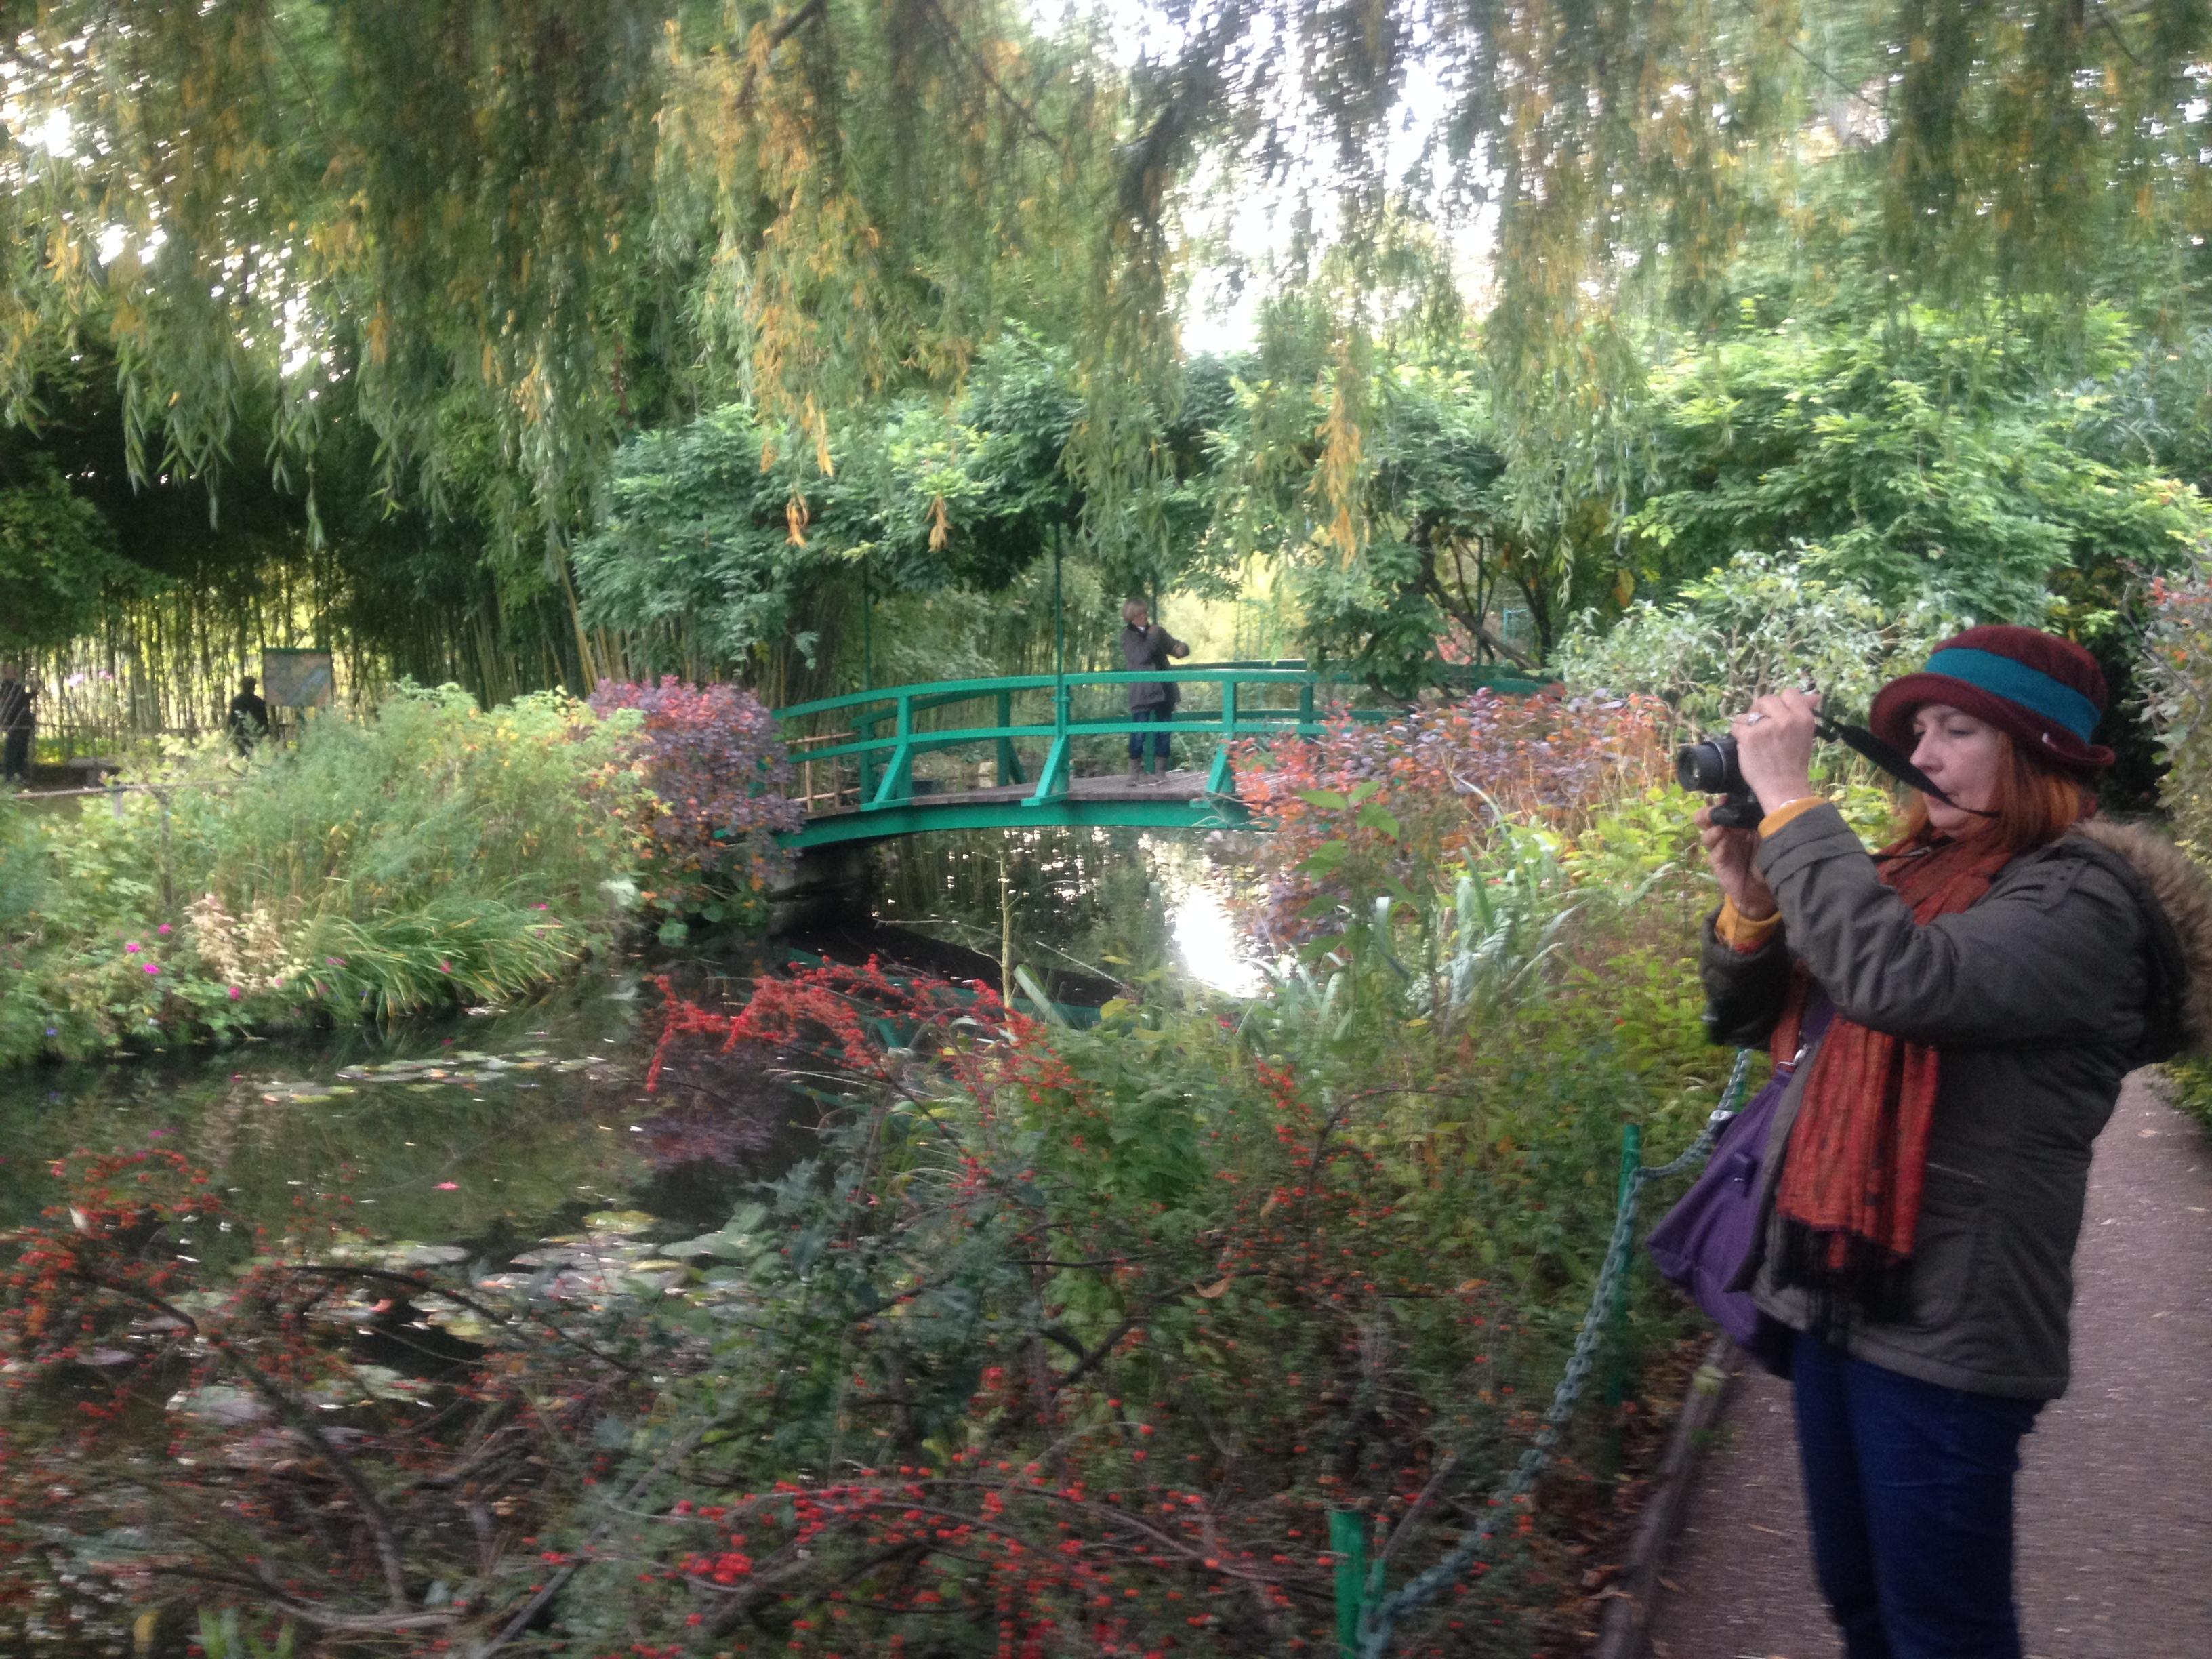 Claude monet s home garden at giverny vernon france for Monet house